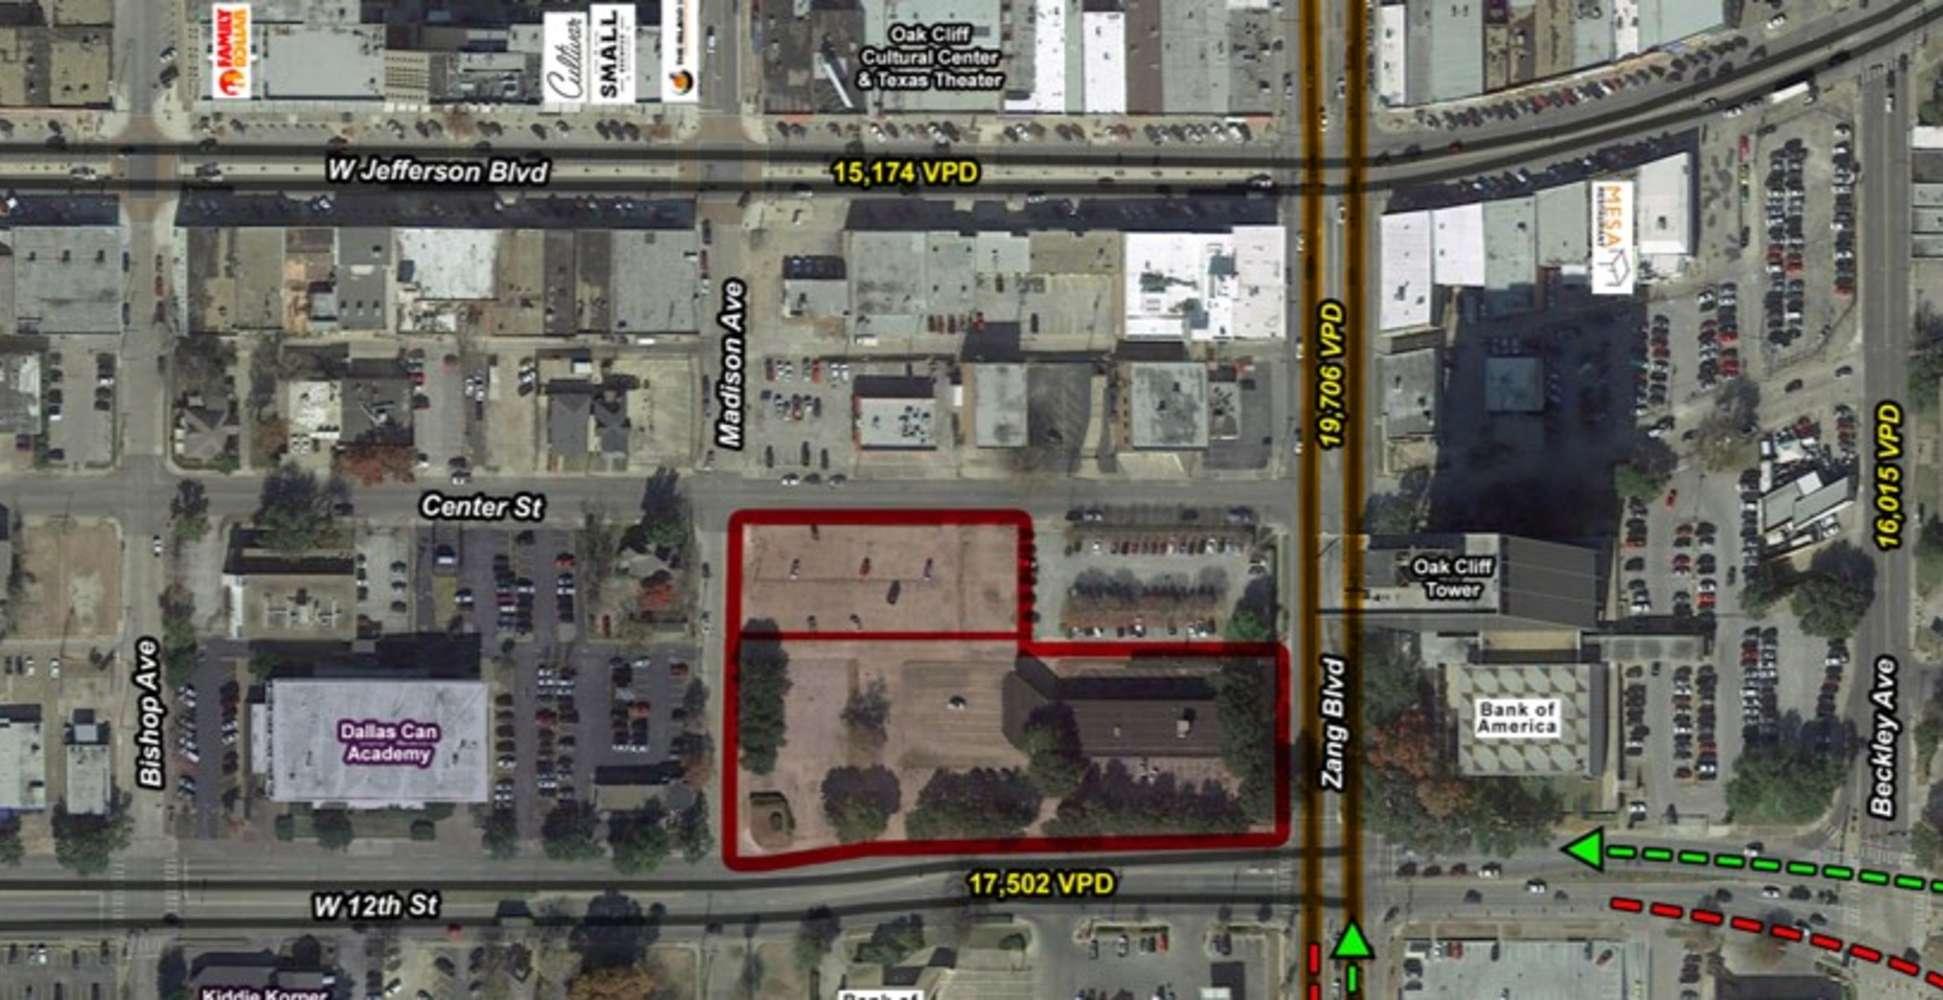 Land Dallas, 75208-6612 - 201 W 12th Street